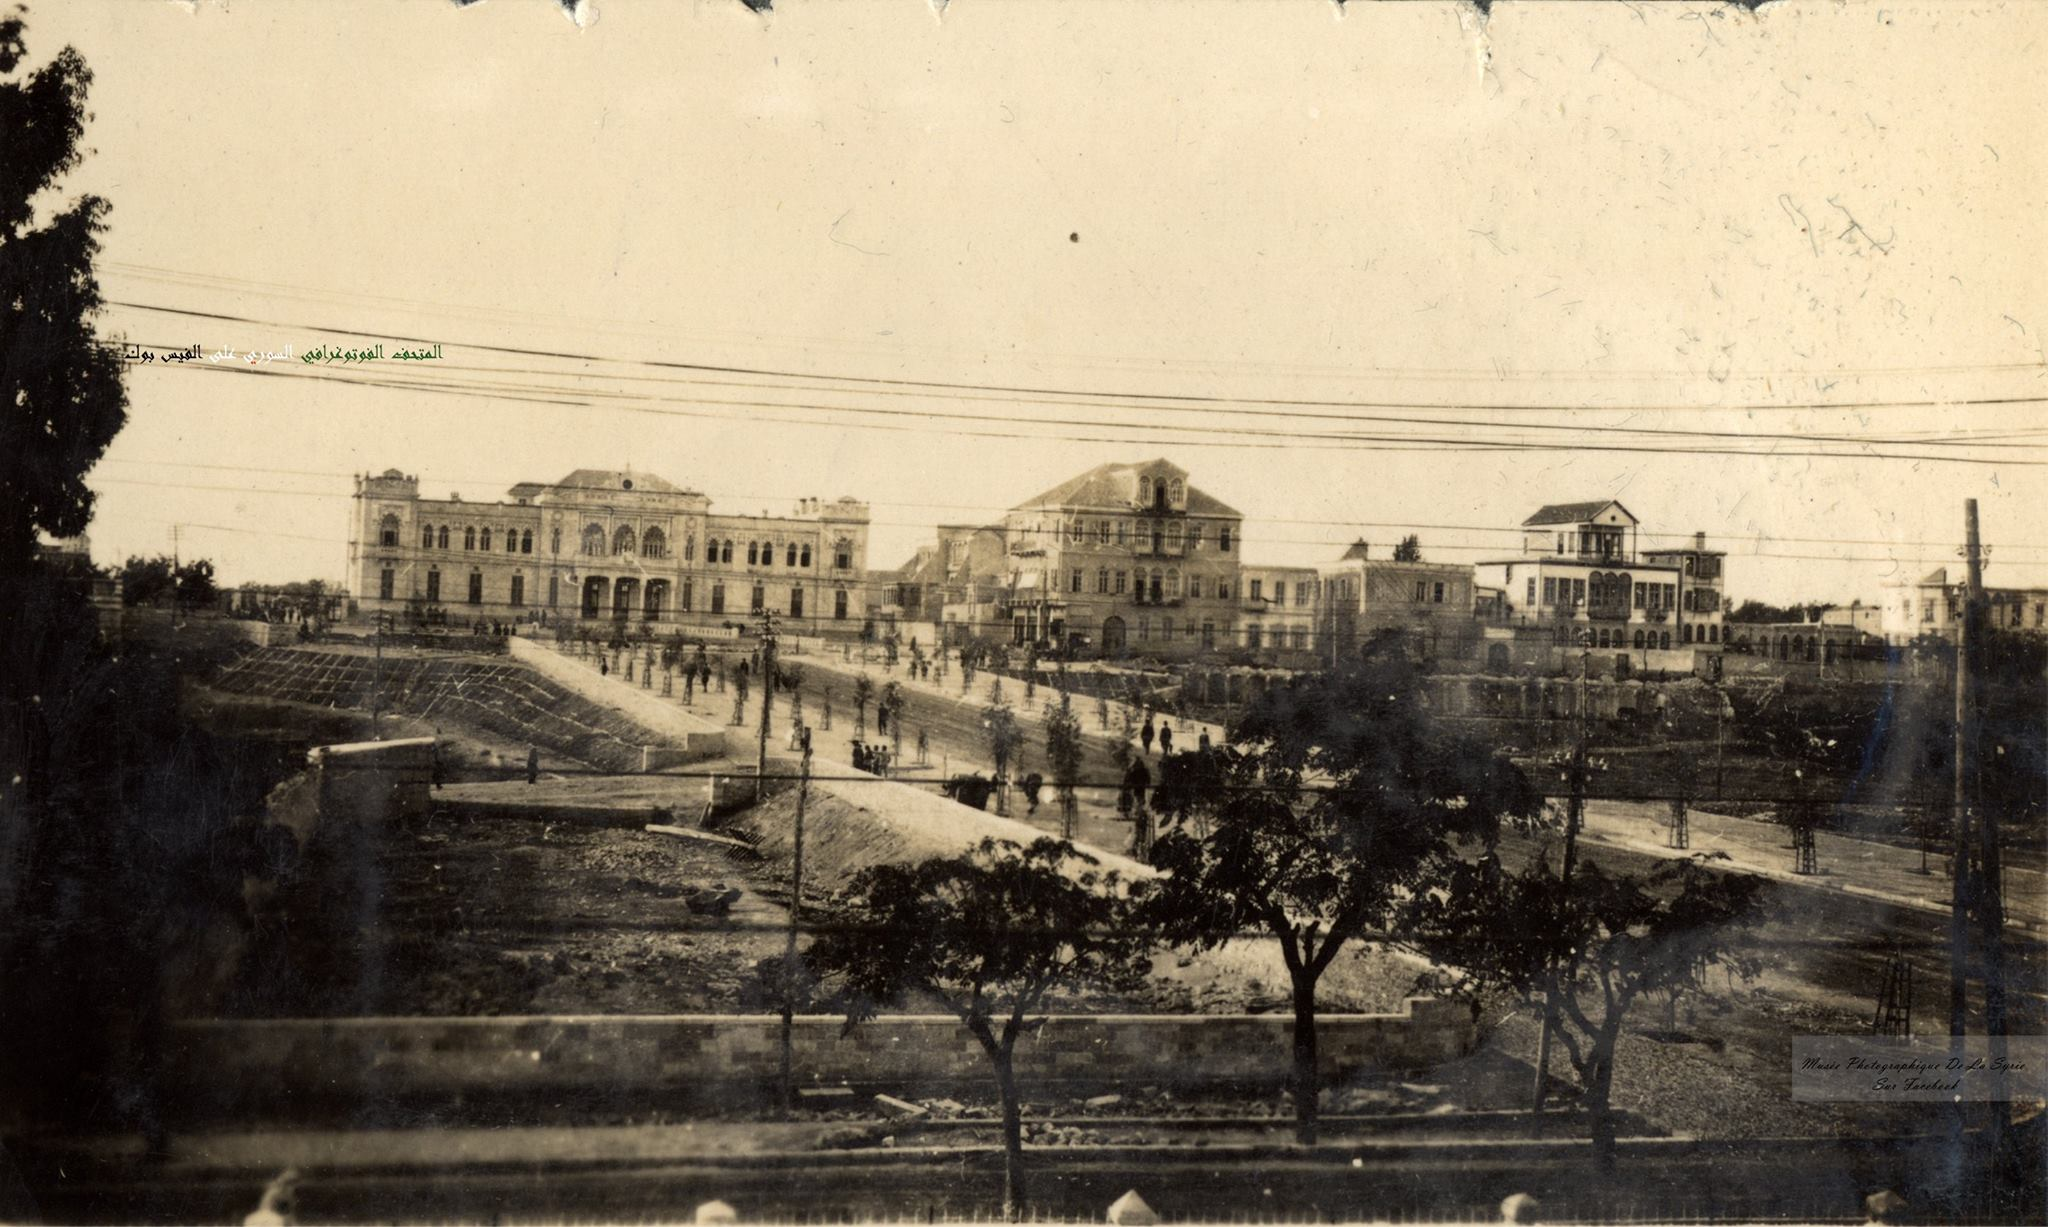 دمشق- محطة الحجاز~1910s